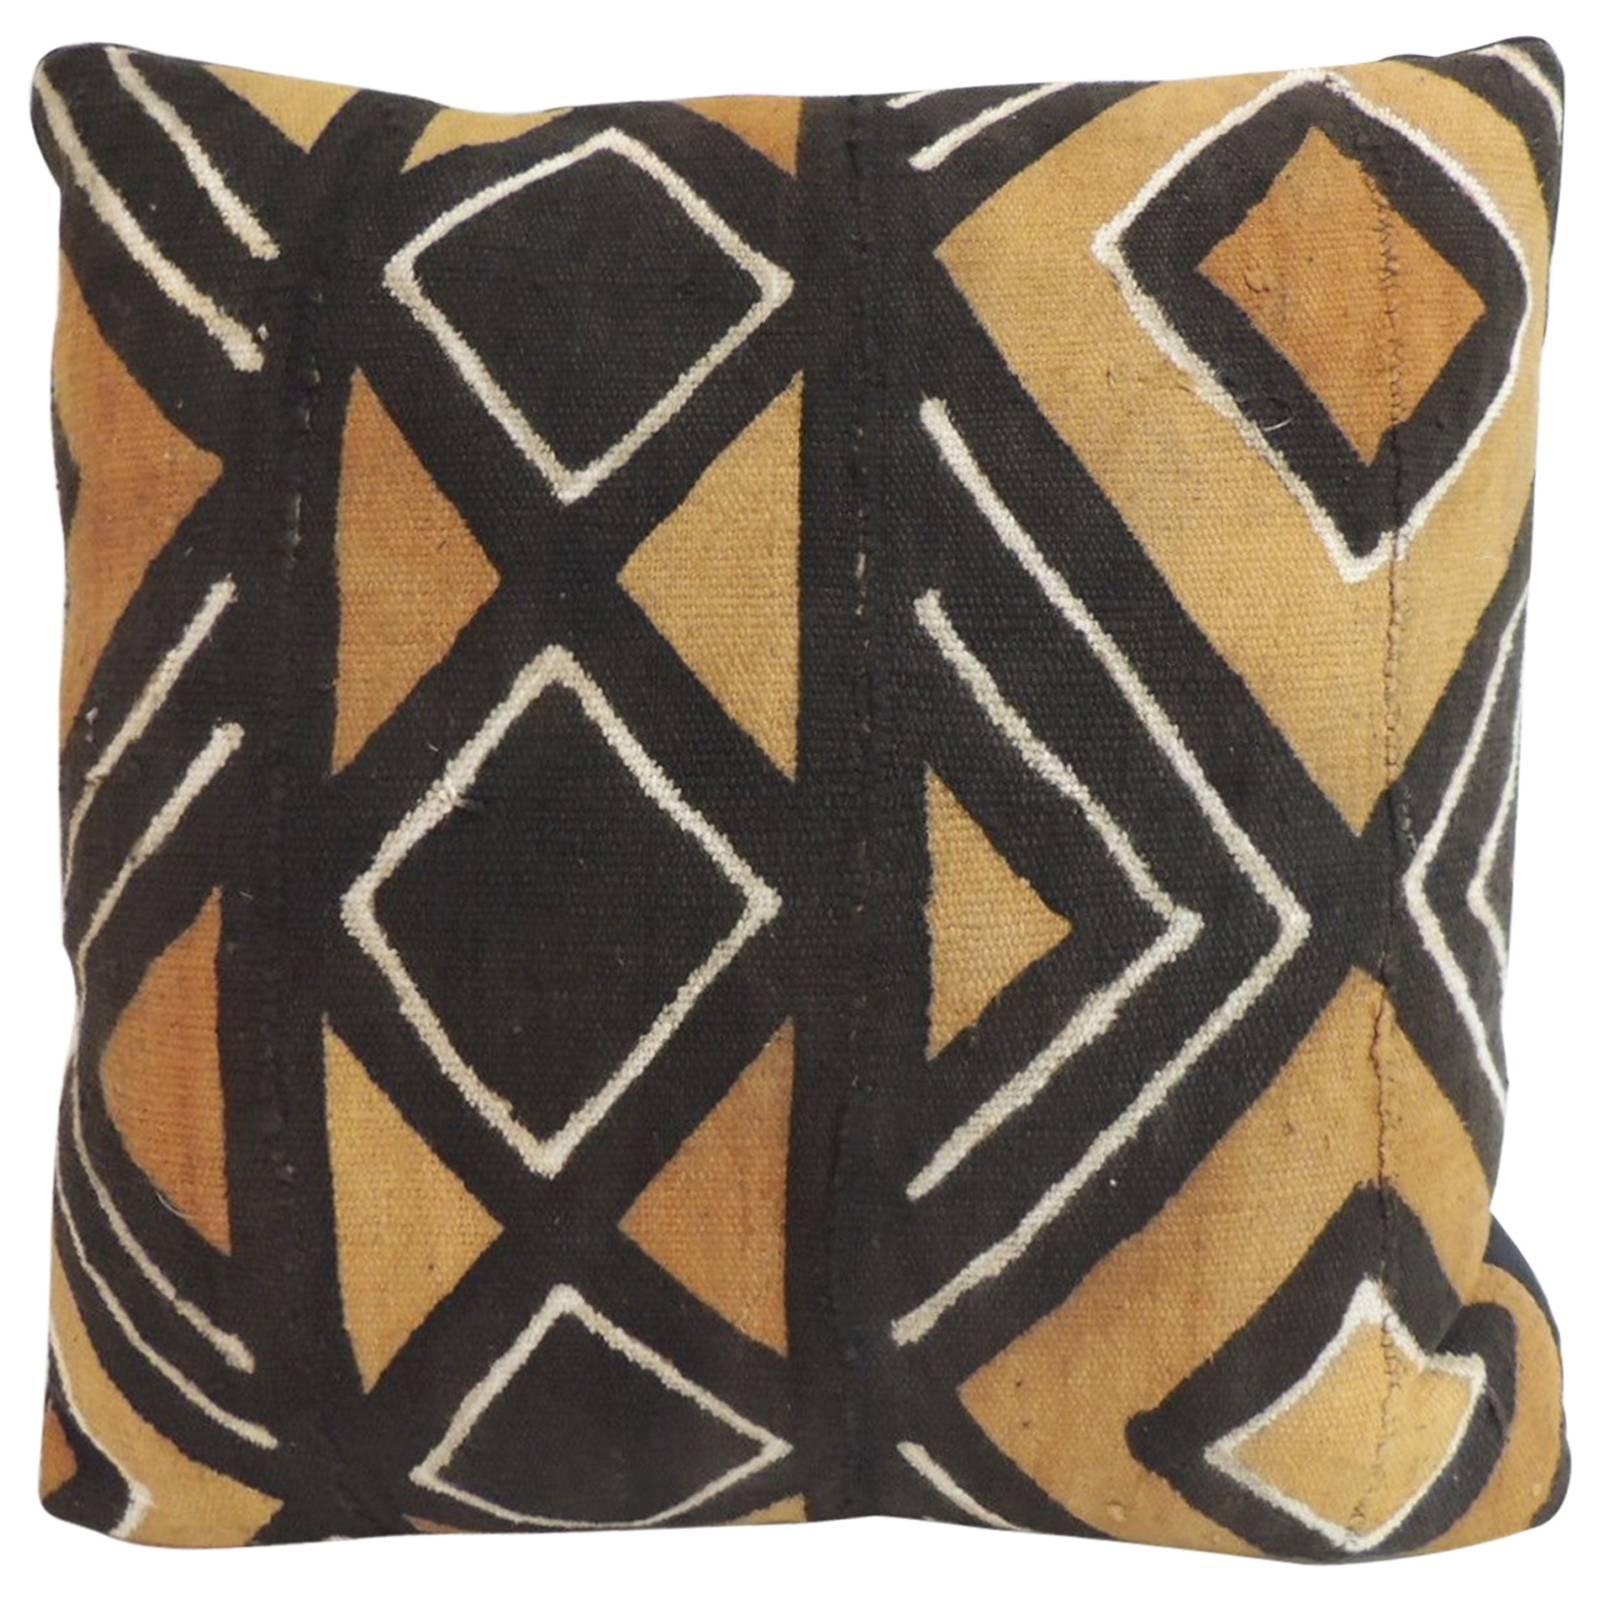 vintage graphic african artisanal textile mud cloth decorative pillow